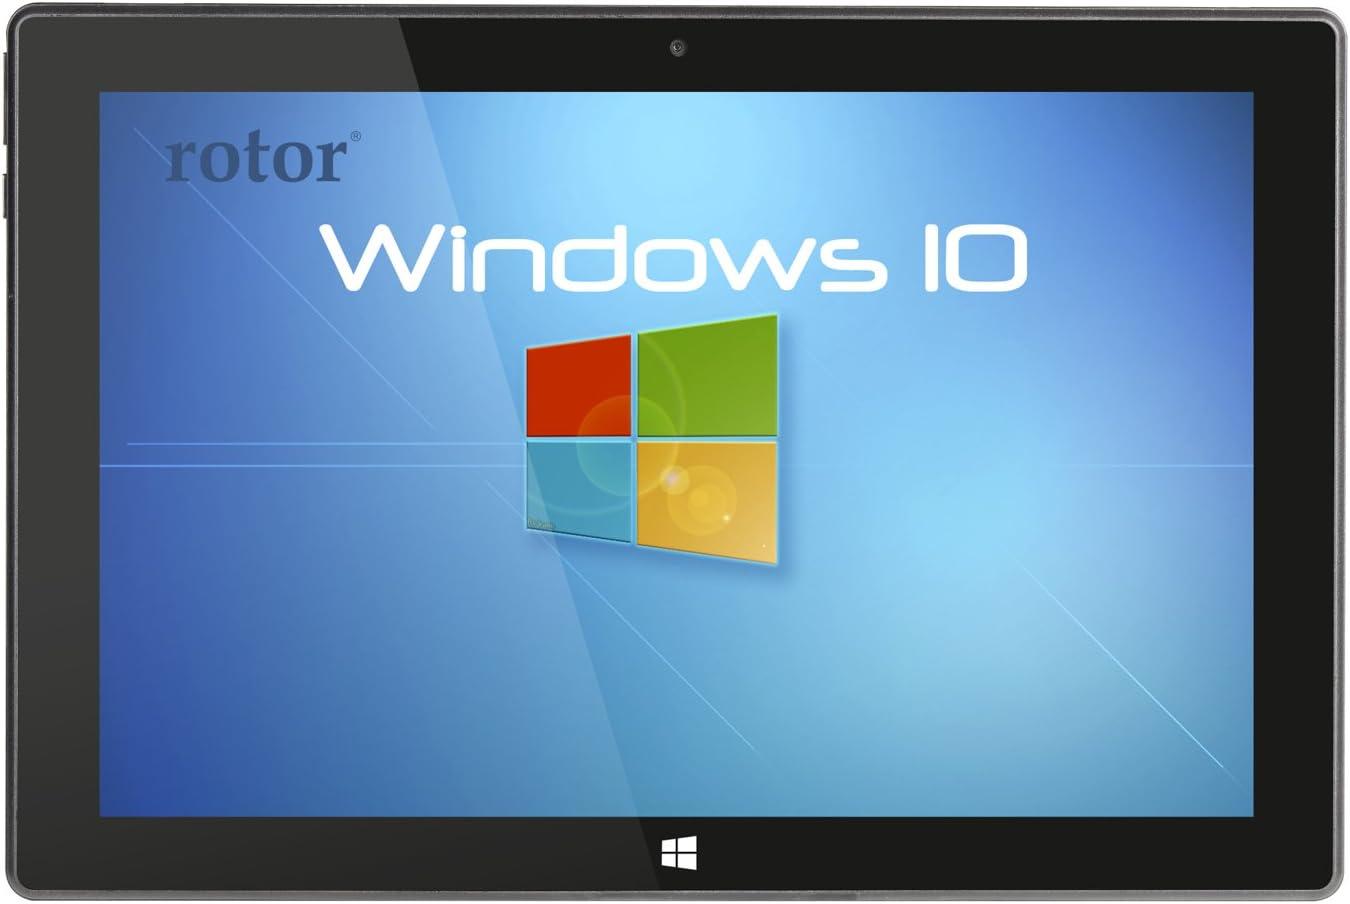 10 Windows 10 Tablet Pc 2 Gb Ram 32 Gb Speicher Amazon De Computer Zubehor